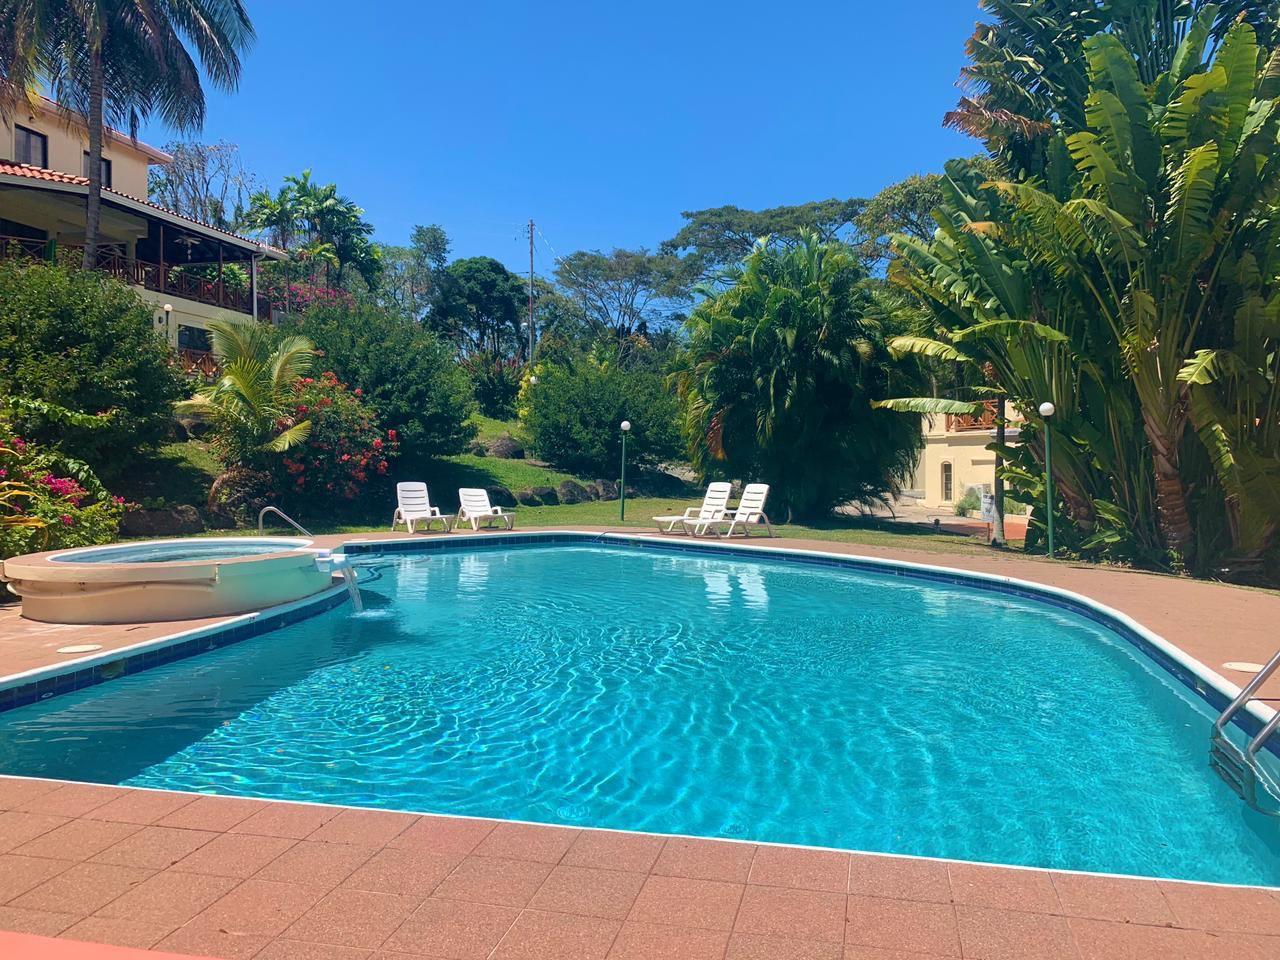 Villas on the Green Pool